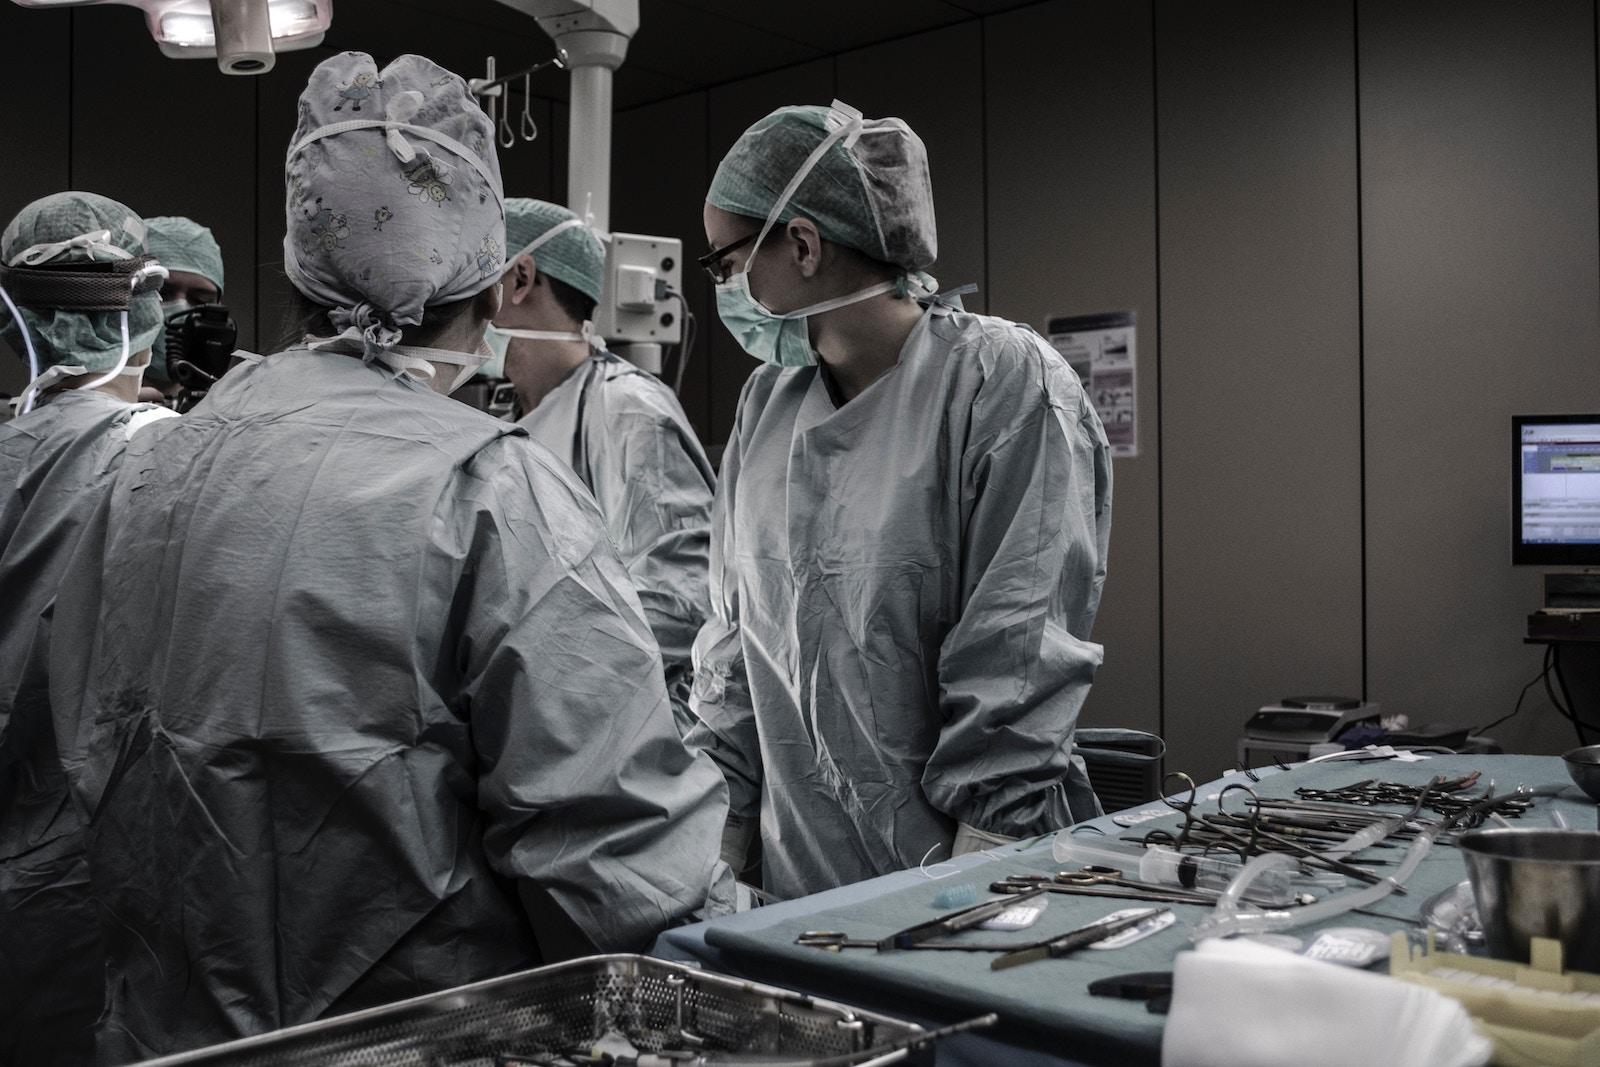 Majbutnje motyvuje — 10 medyčnyh innovacij sučasnoї Ukraїny